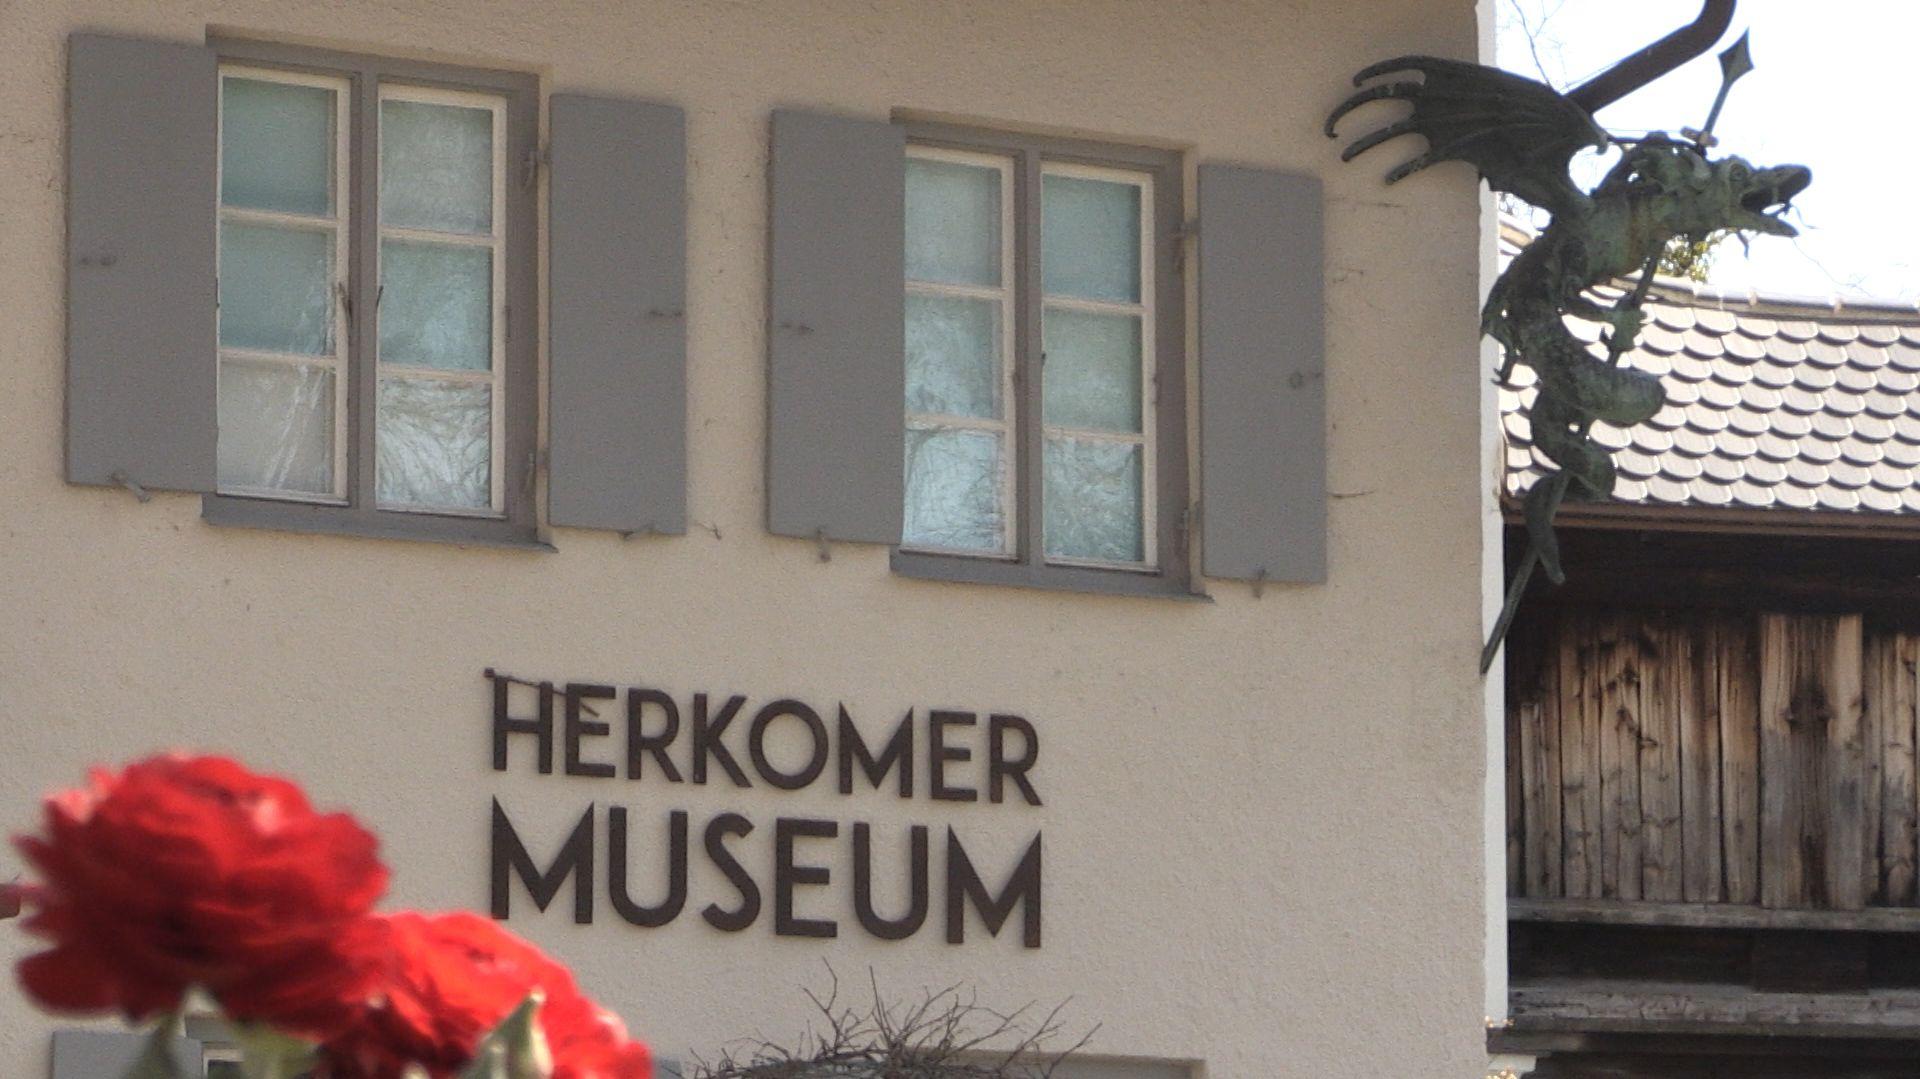 Herkomer-Museum in Landsberg am Lech